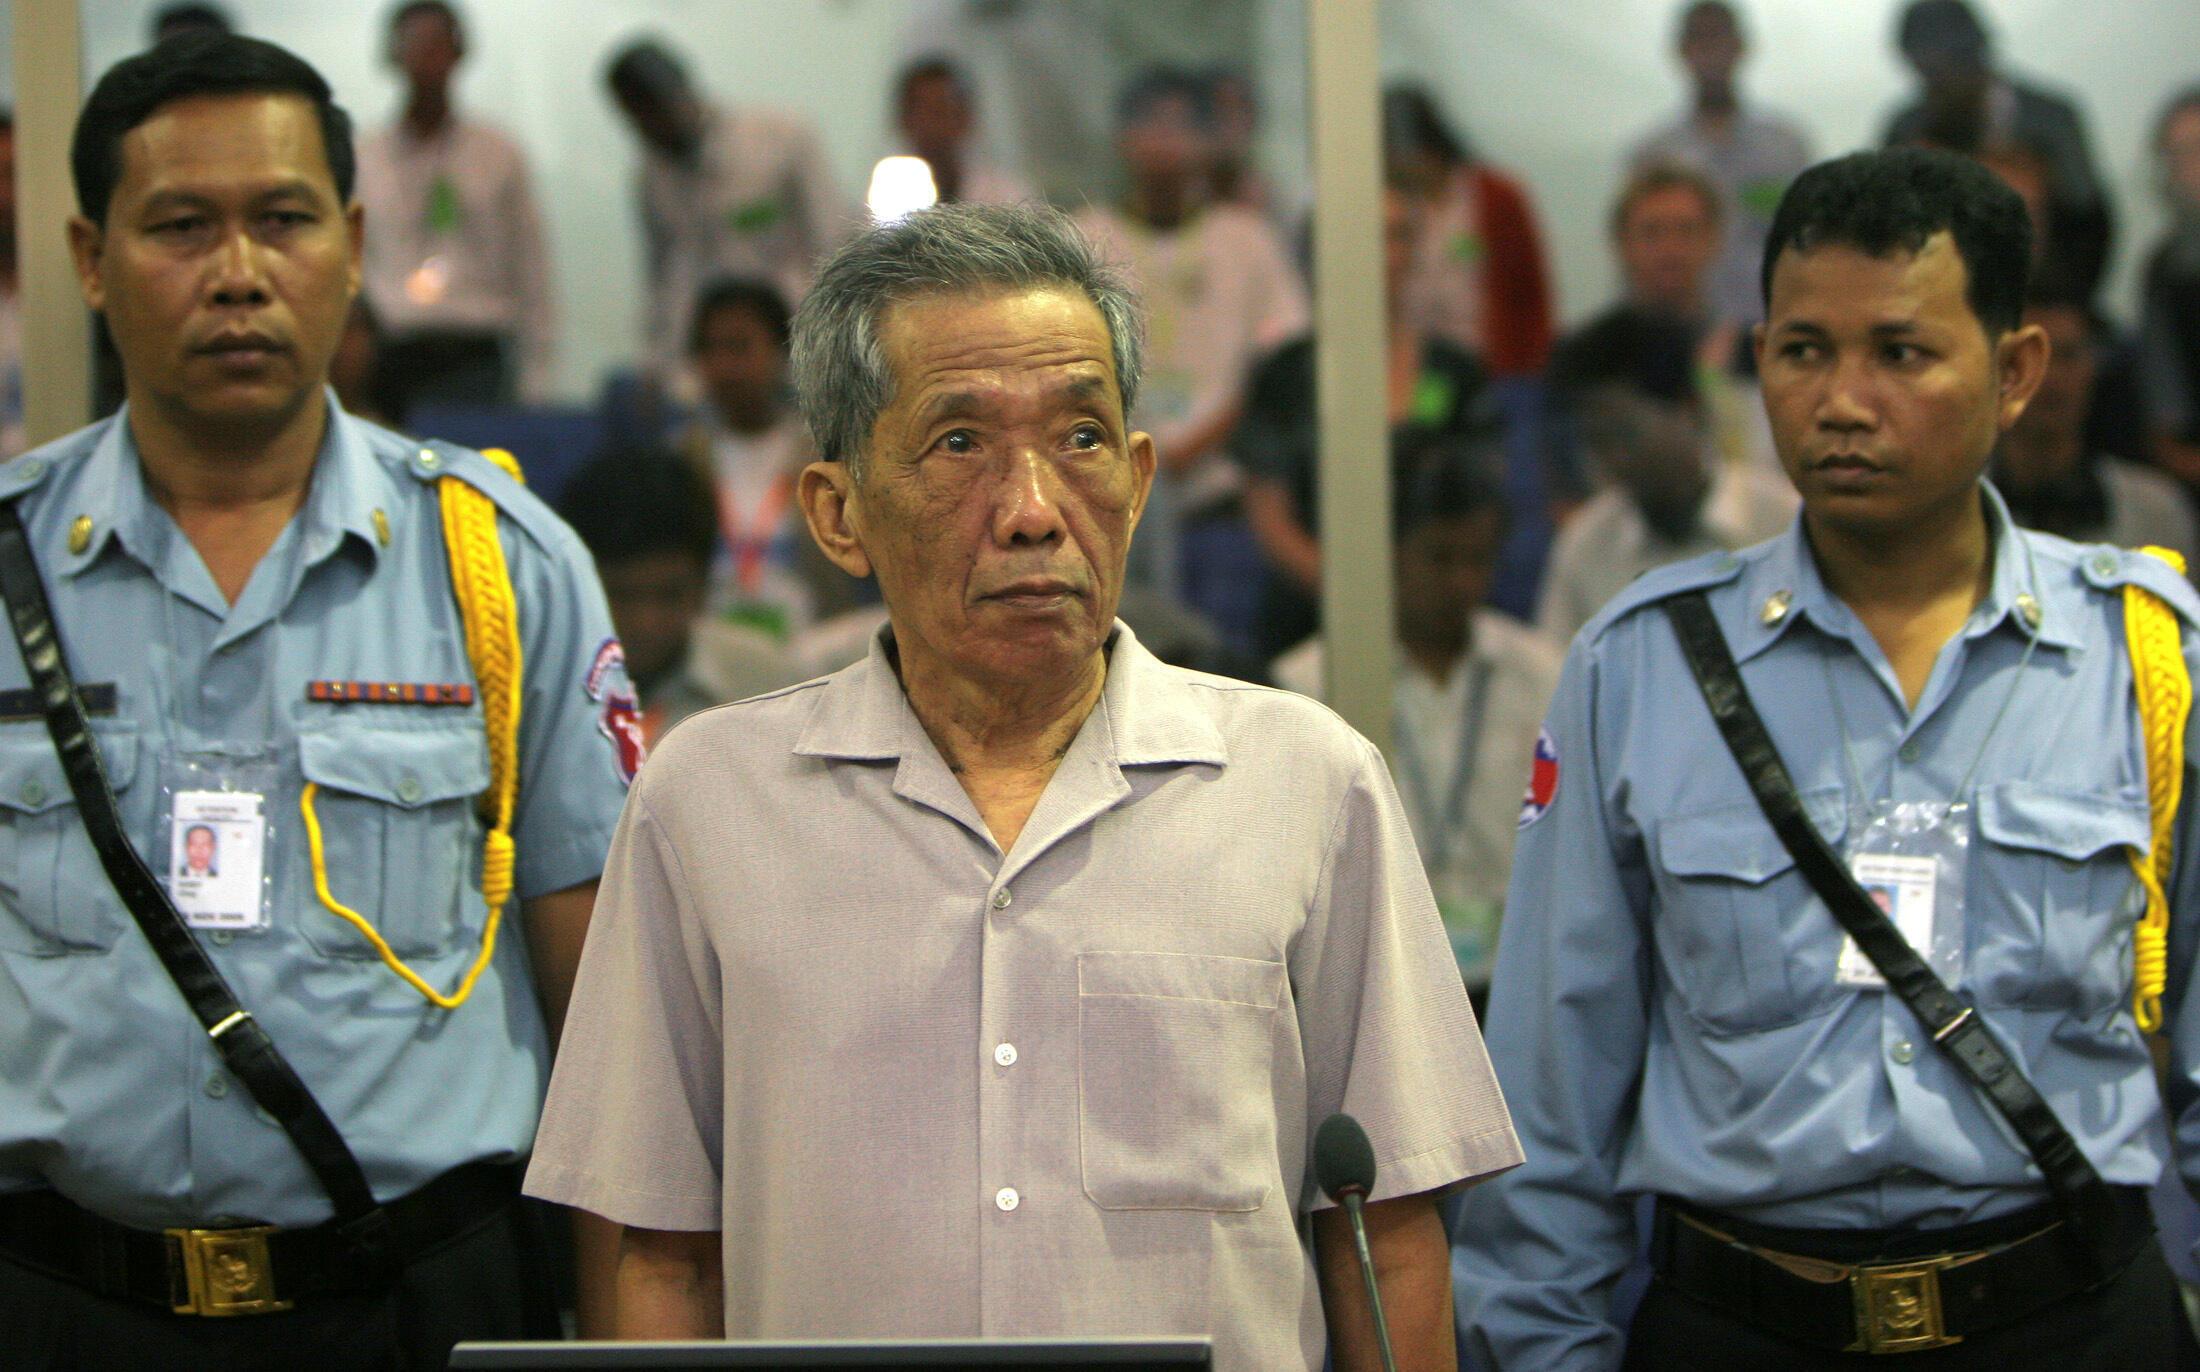 Kaing Guek Eav, alias Duch, en décembre 2008.